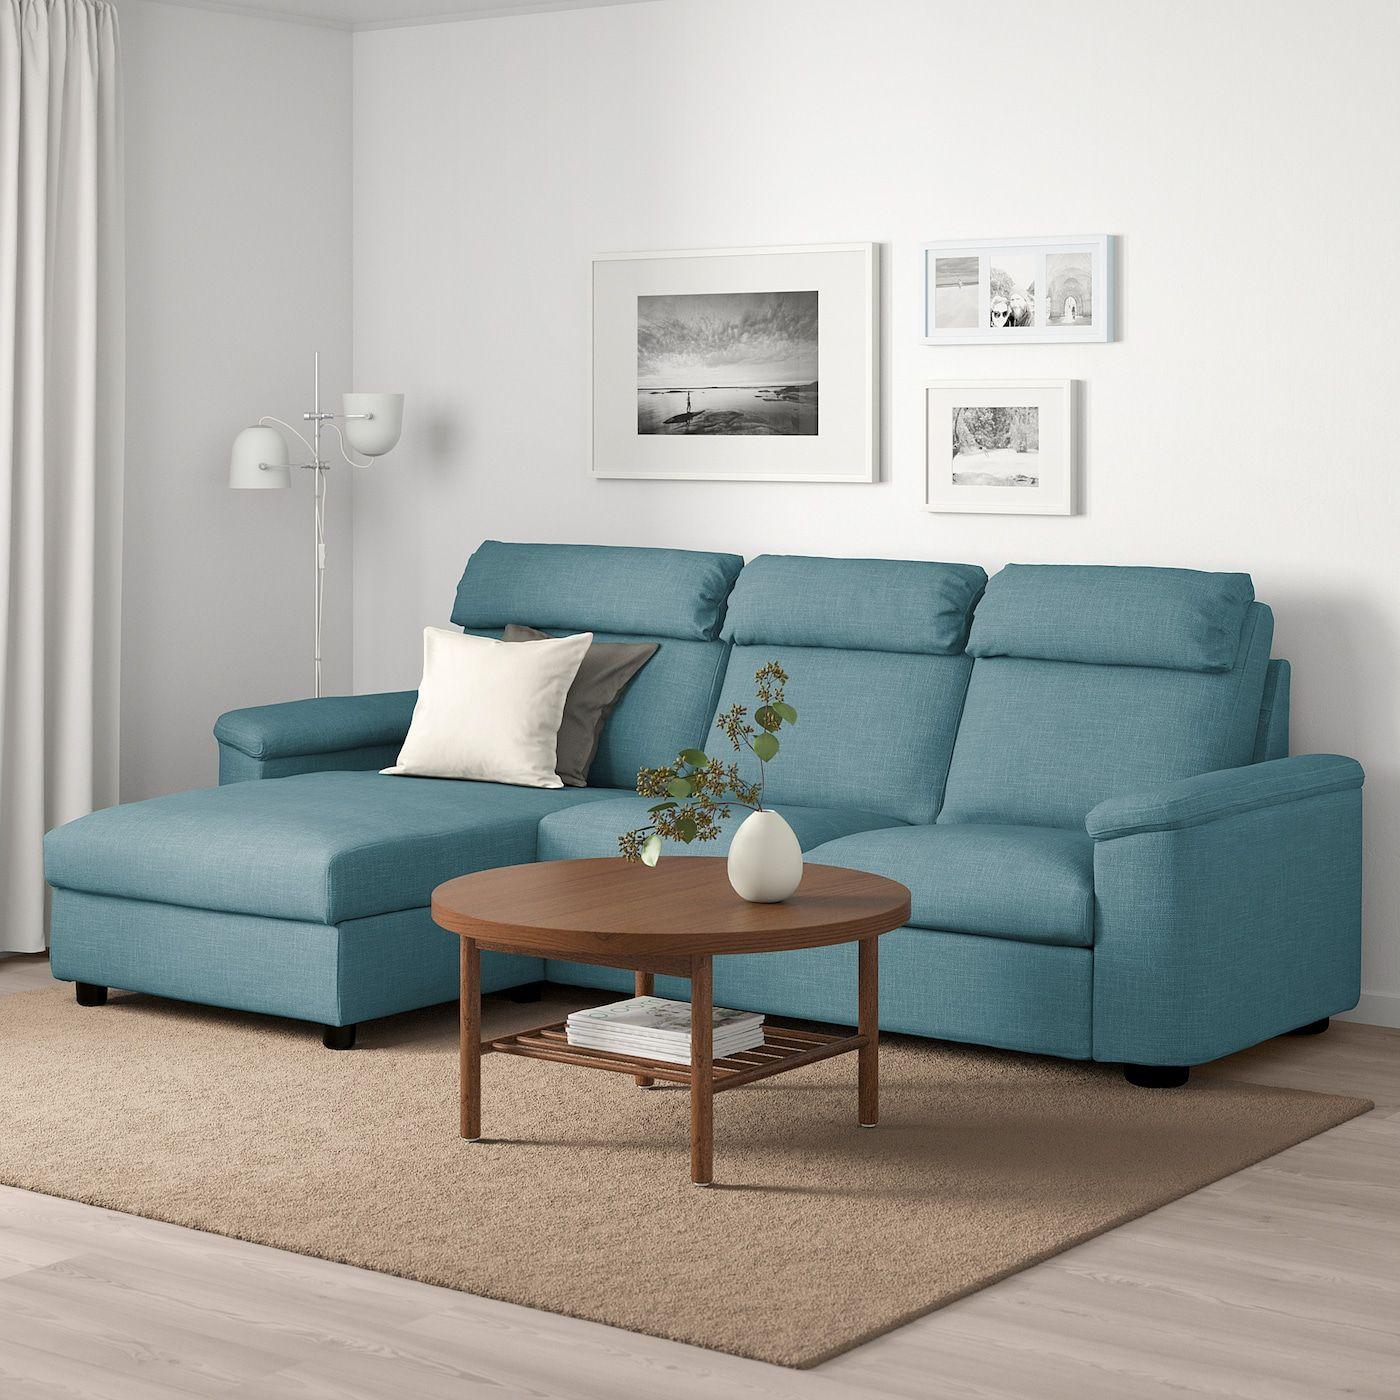 Lidhult Sofabed With Chaise Gassebol Blue Gray Sofa Sofa Back Cushions Sleeper Sofa